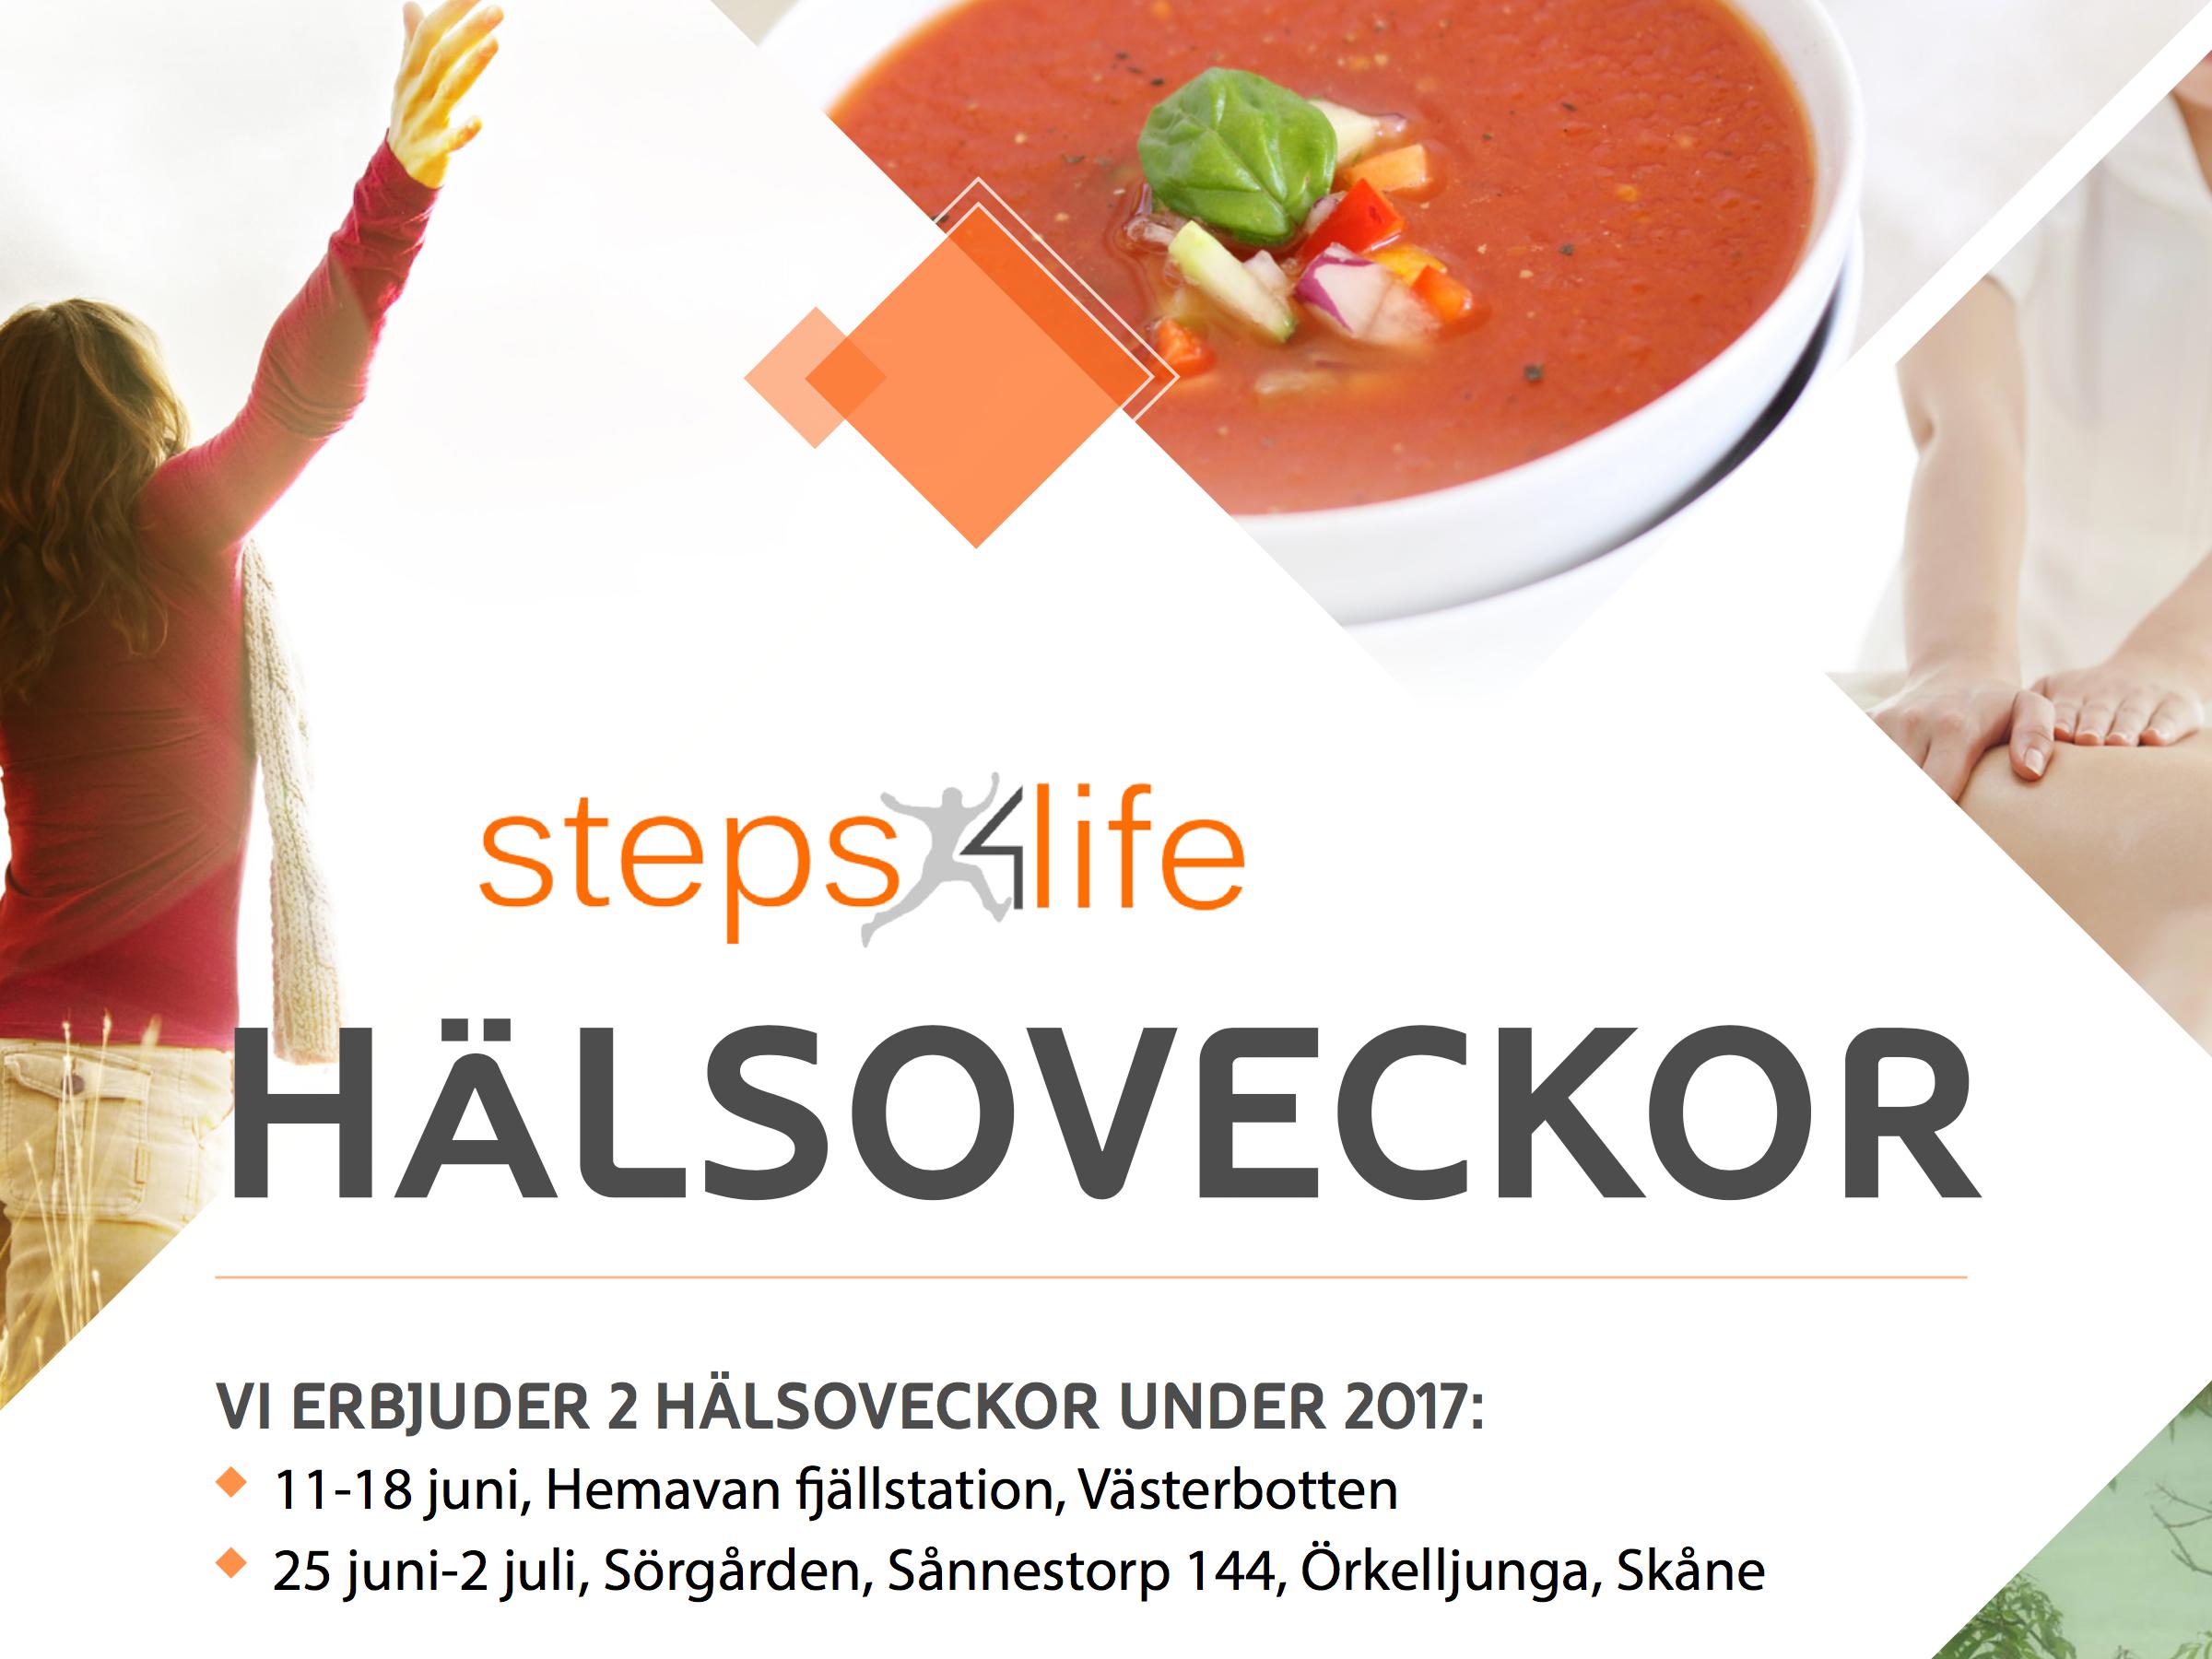 Steps4life